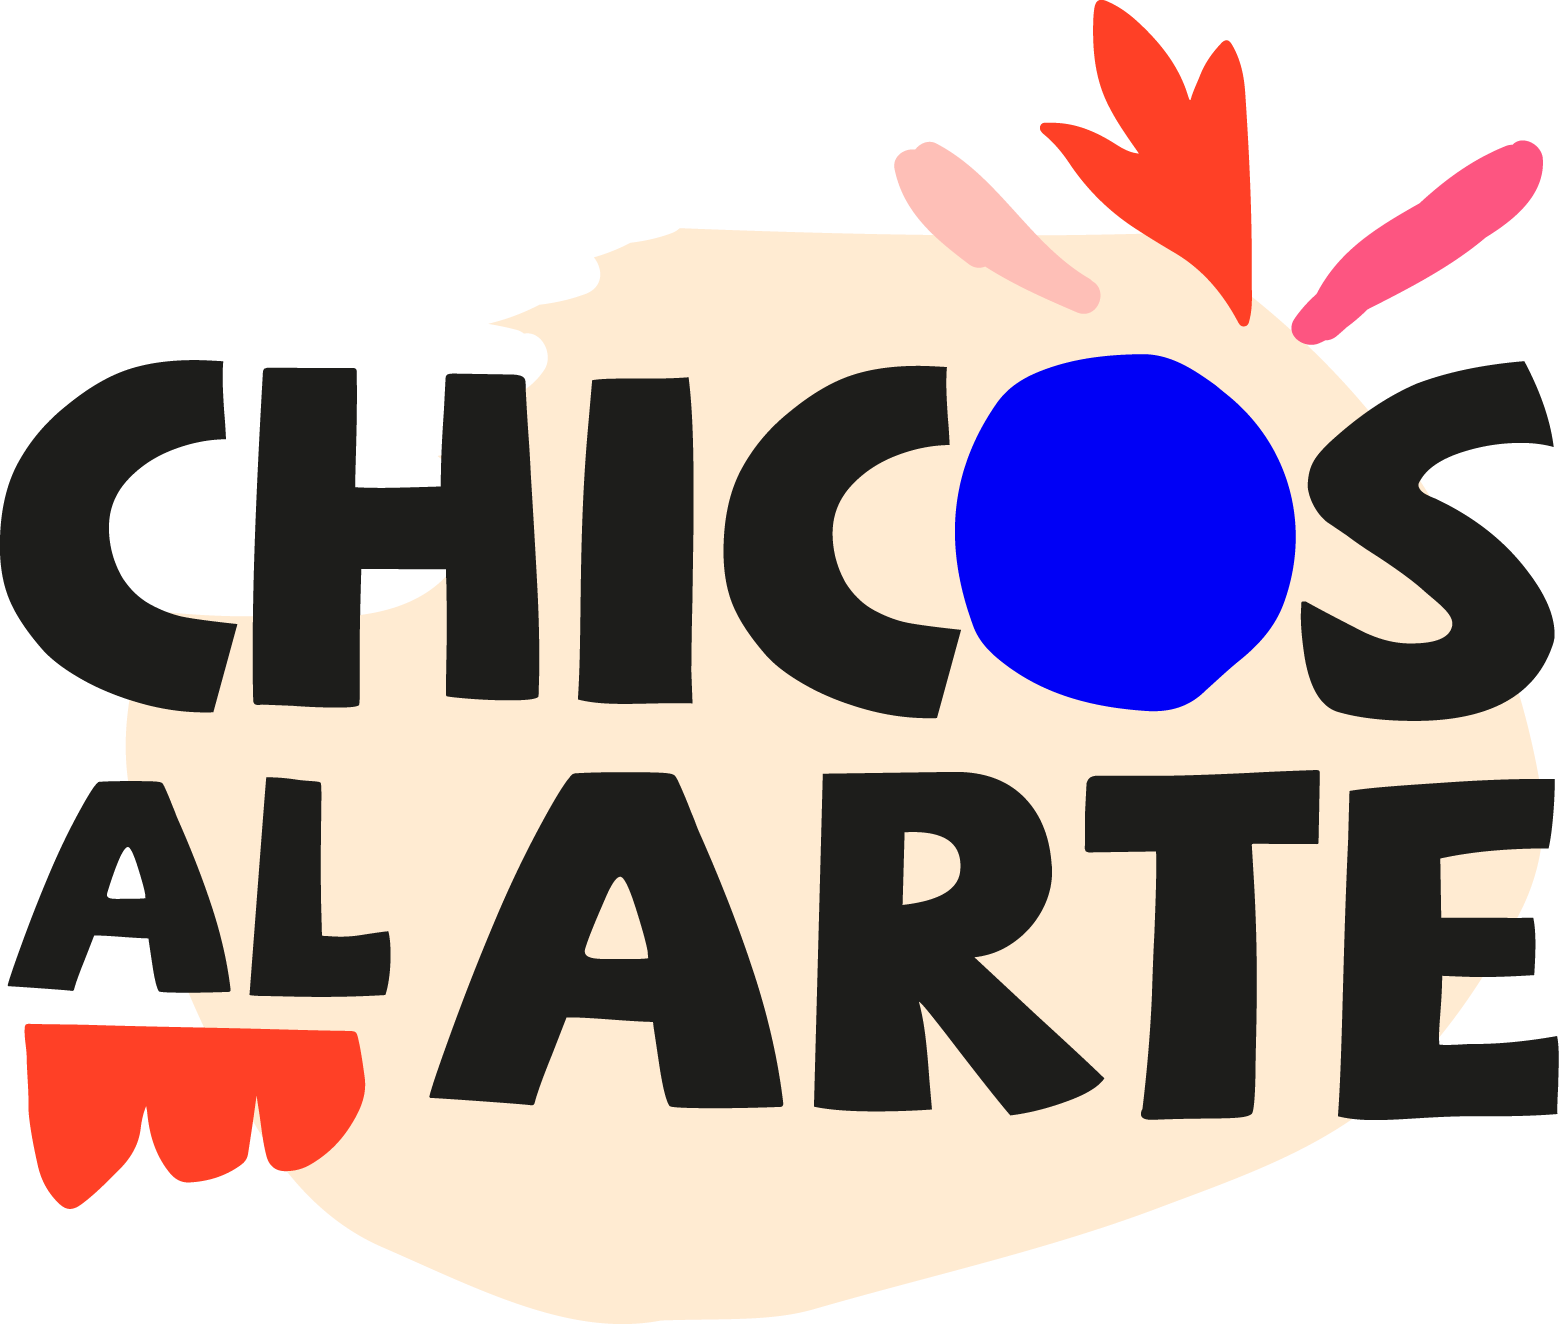 Chicos al arte